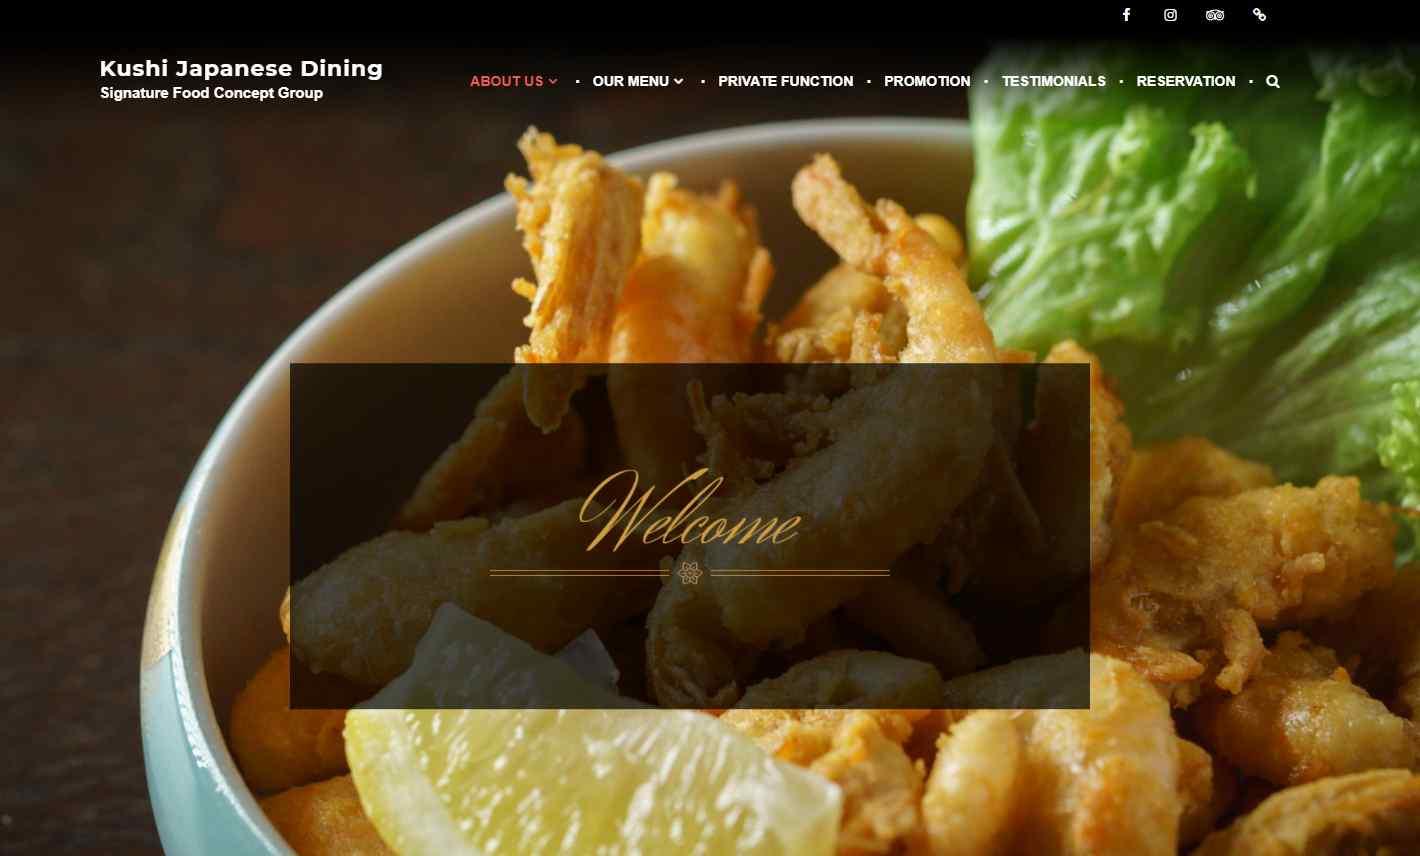 kushi dining Top Japanese Buffets in Singapore